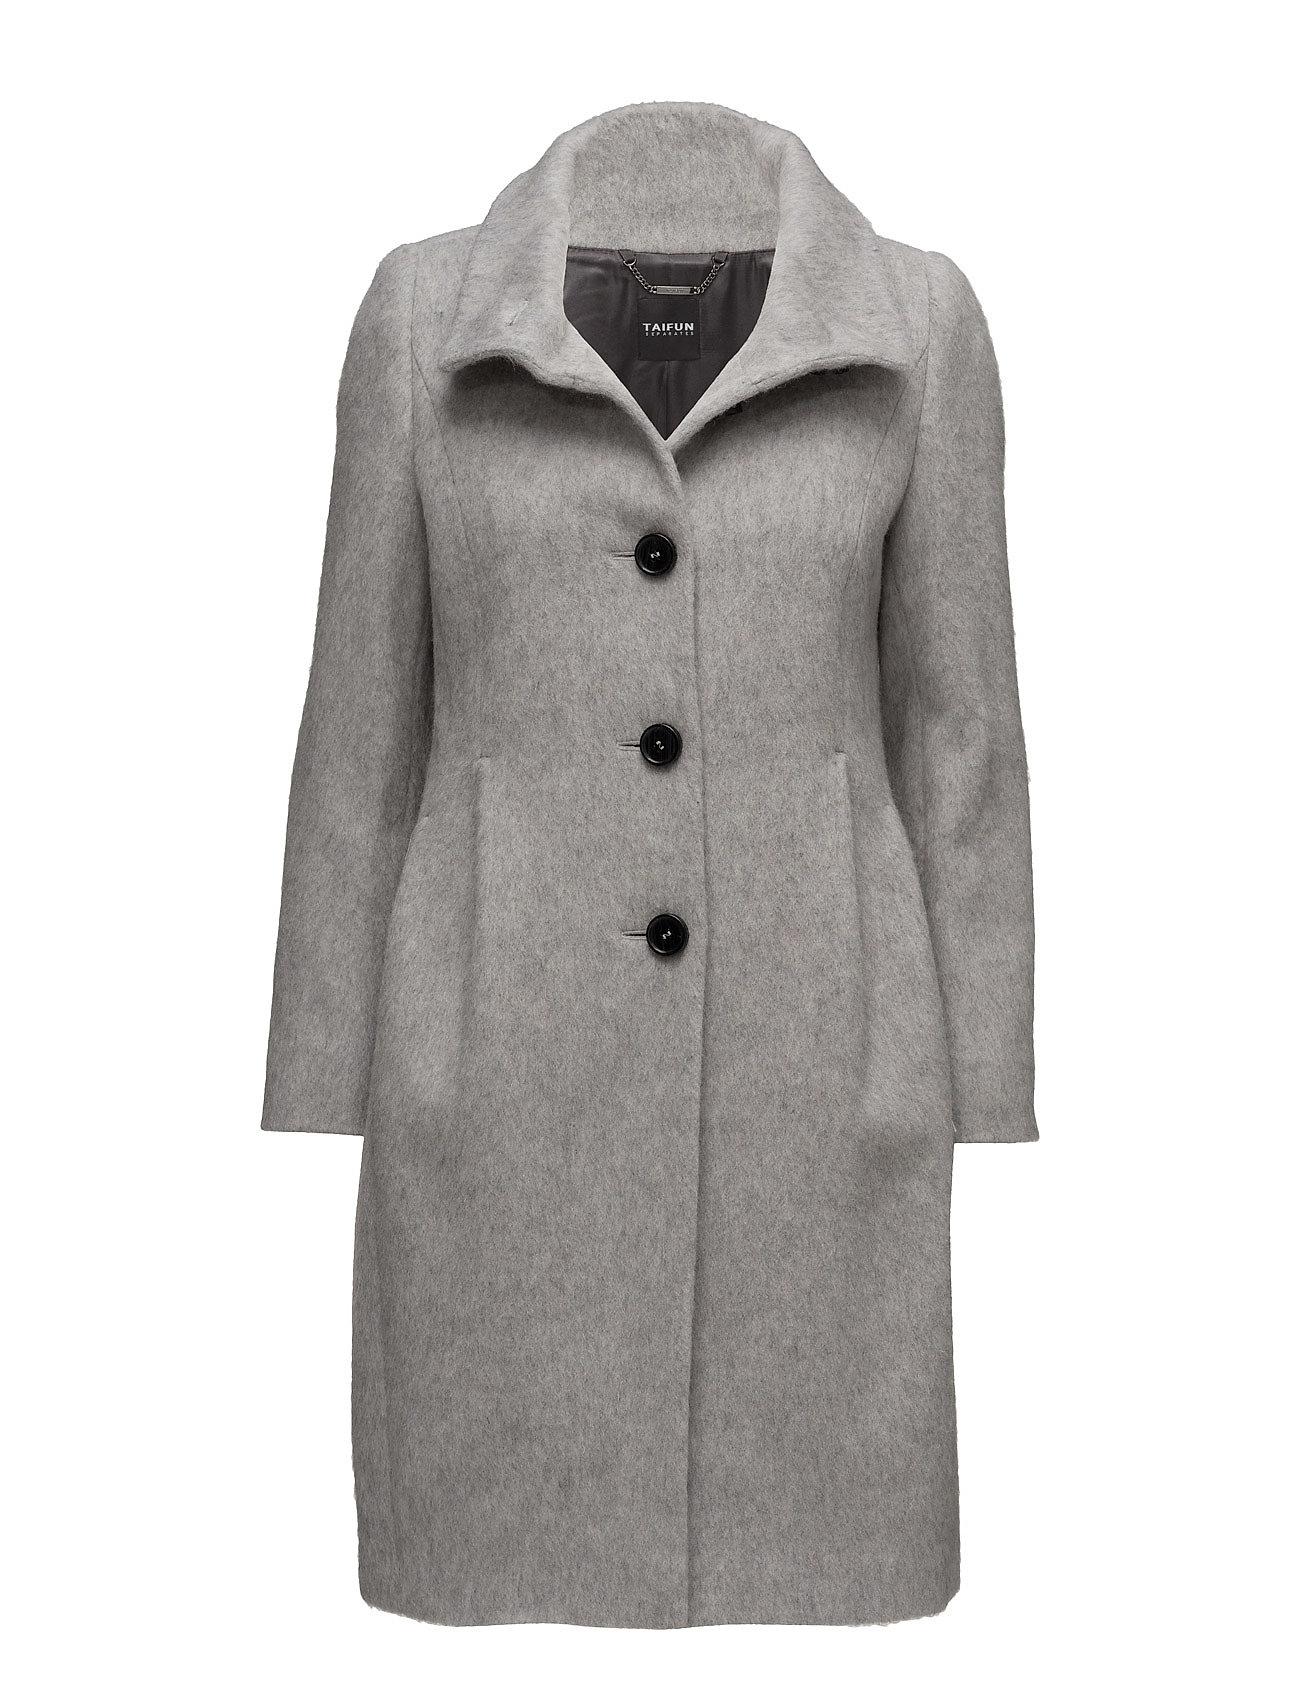 Coat wool fra taifun fra boozt.com dk